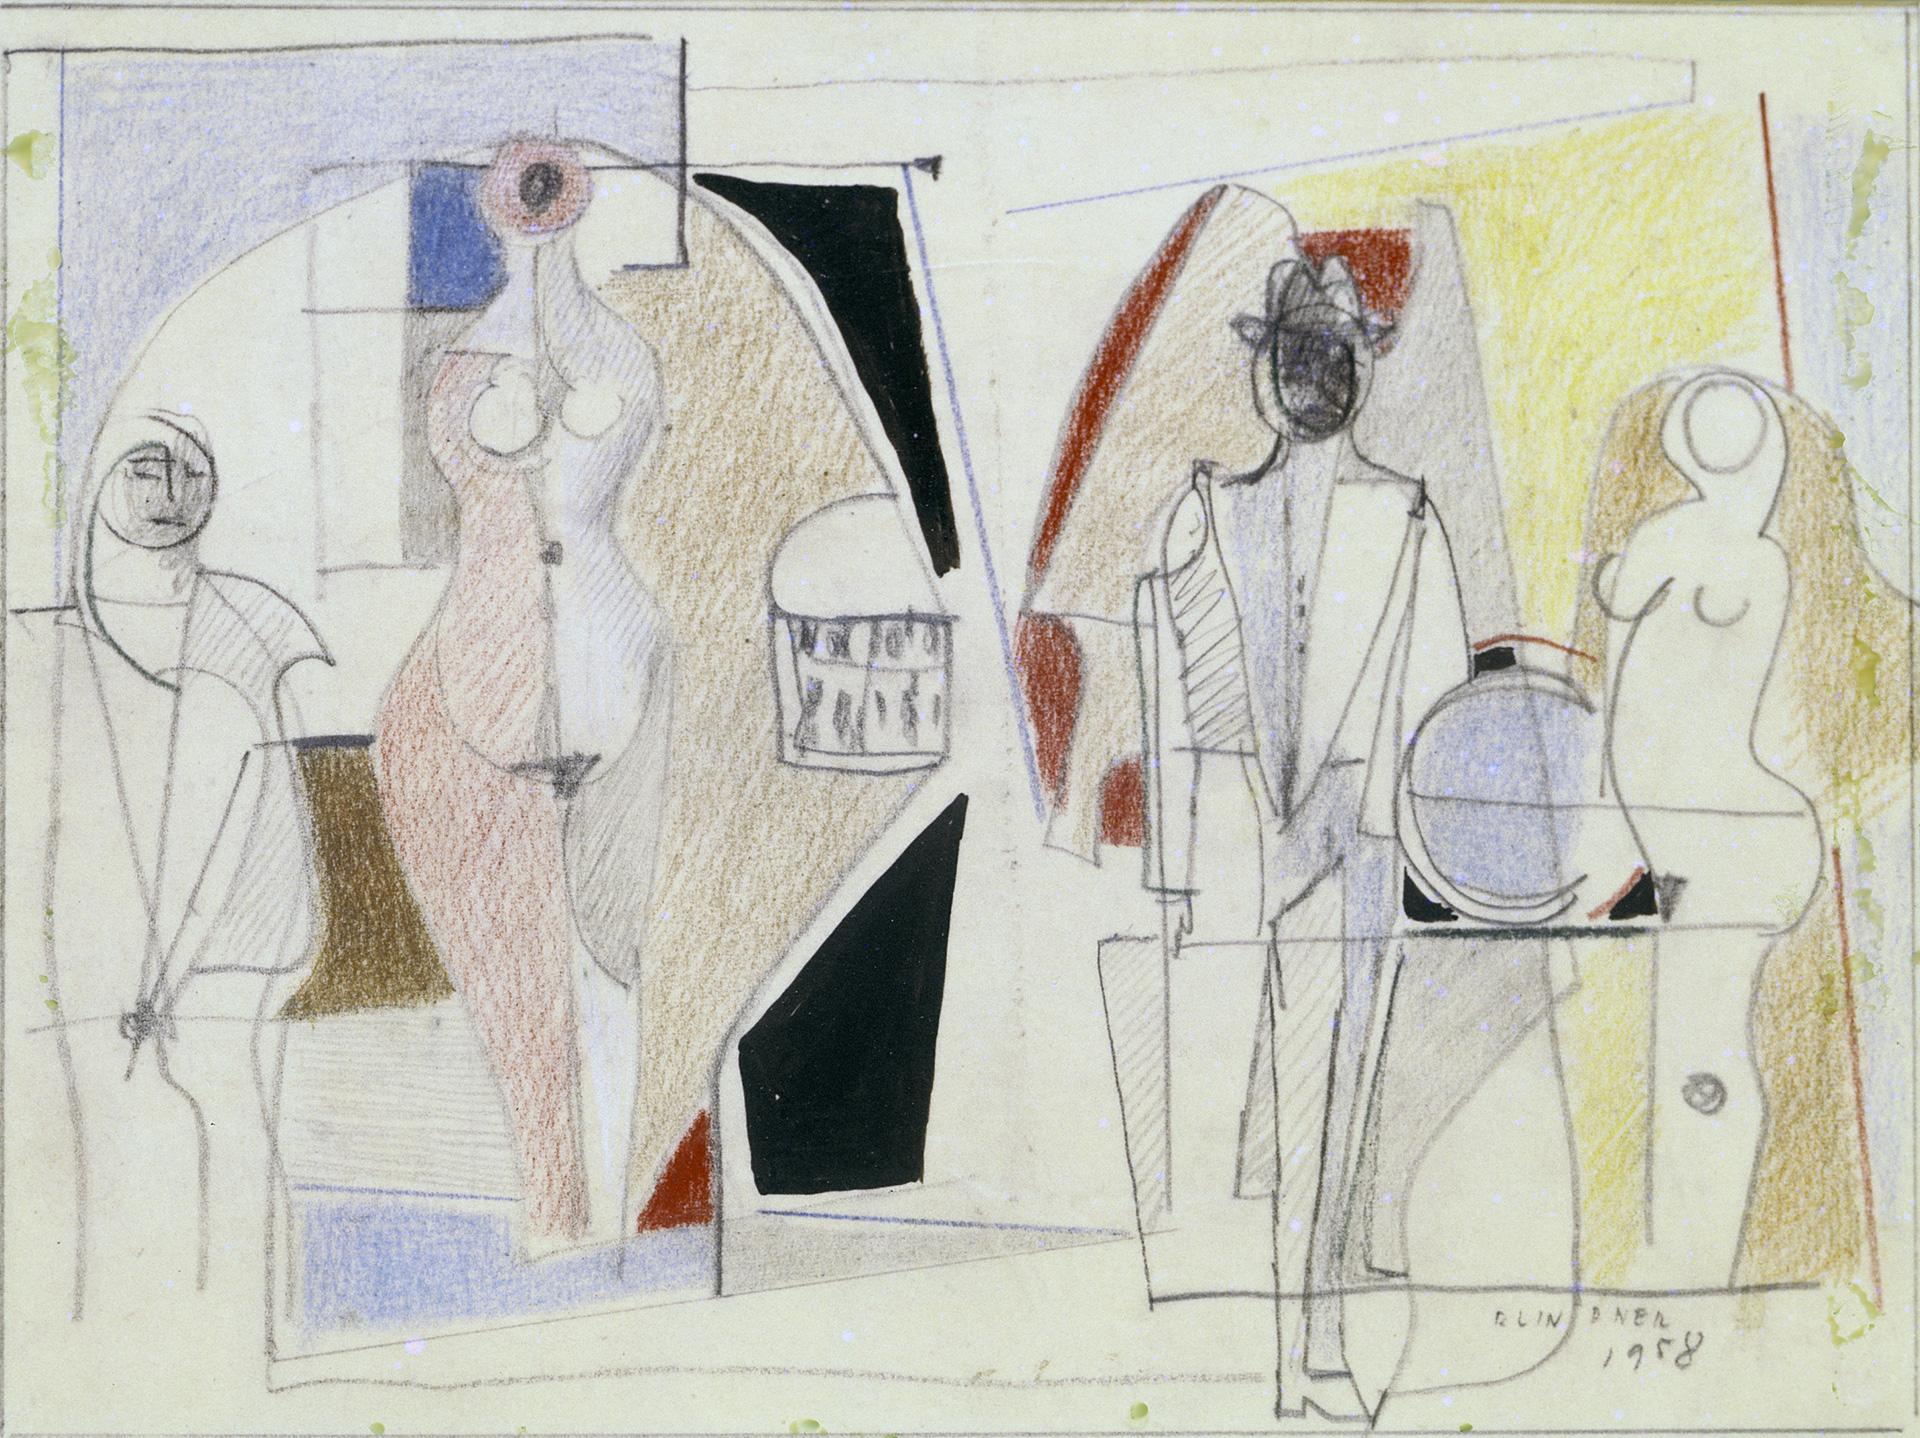 Untitled, 1960